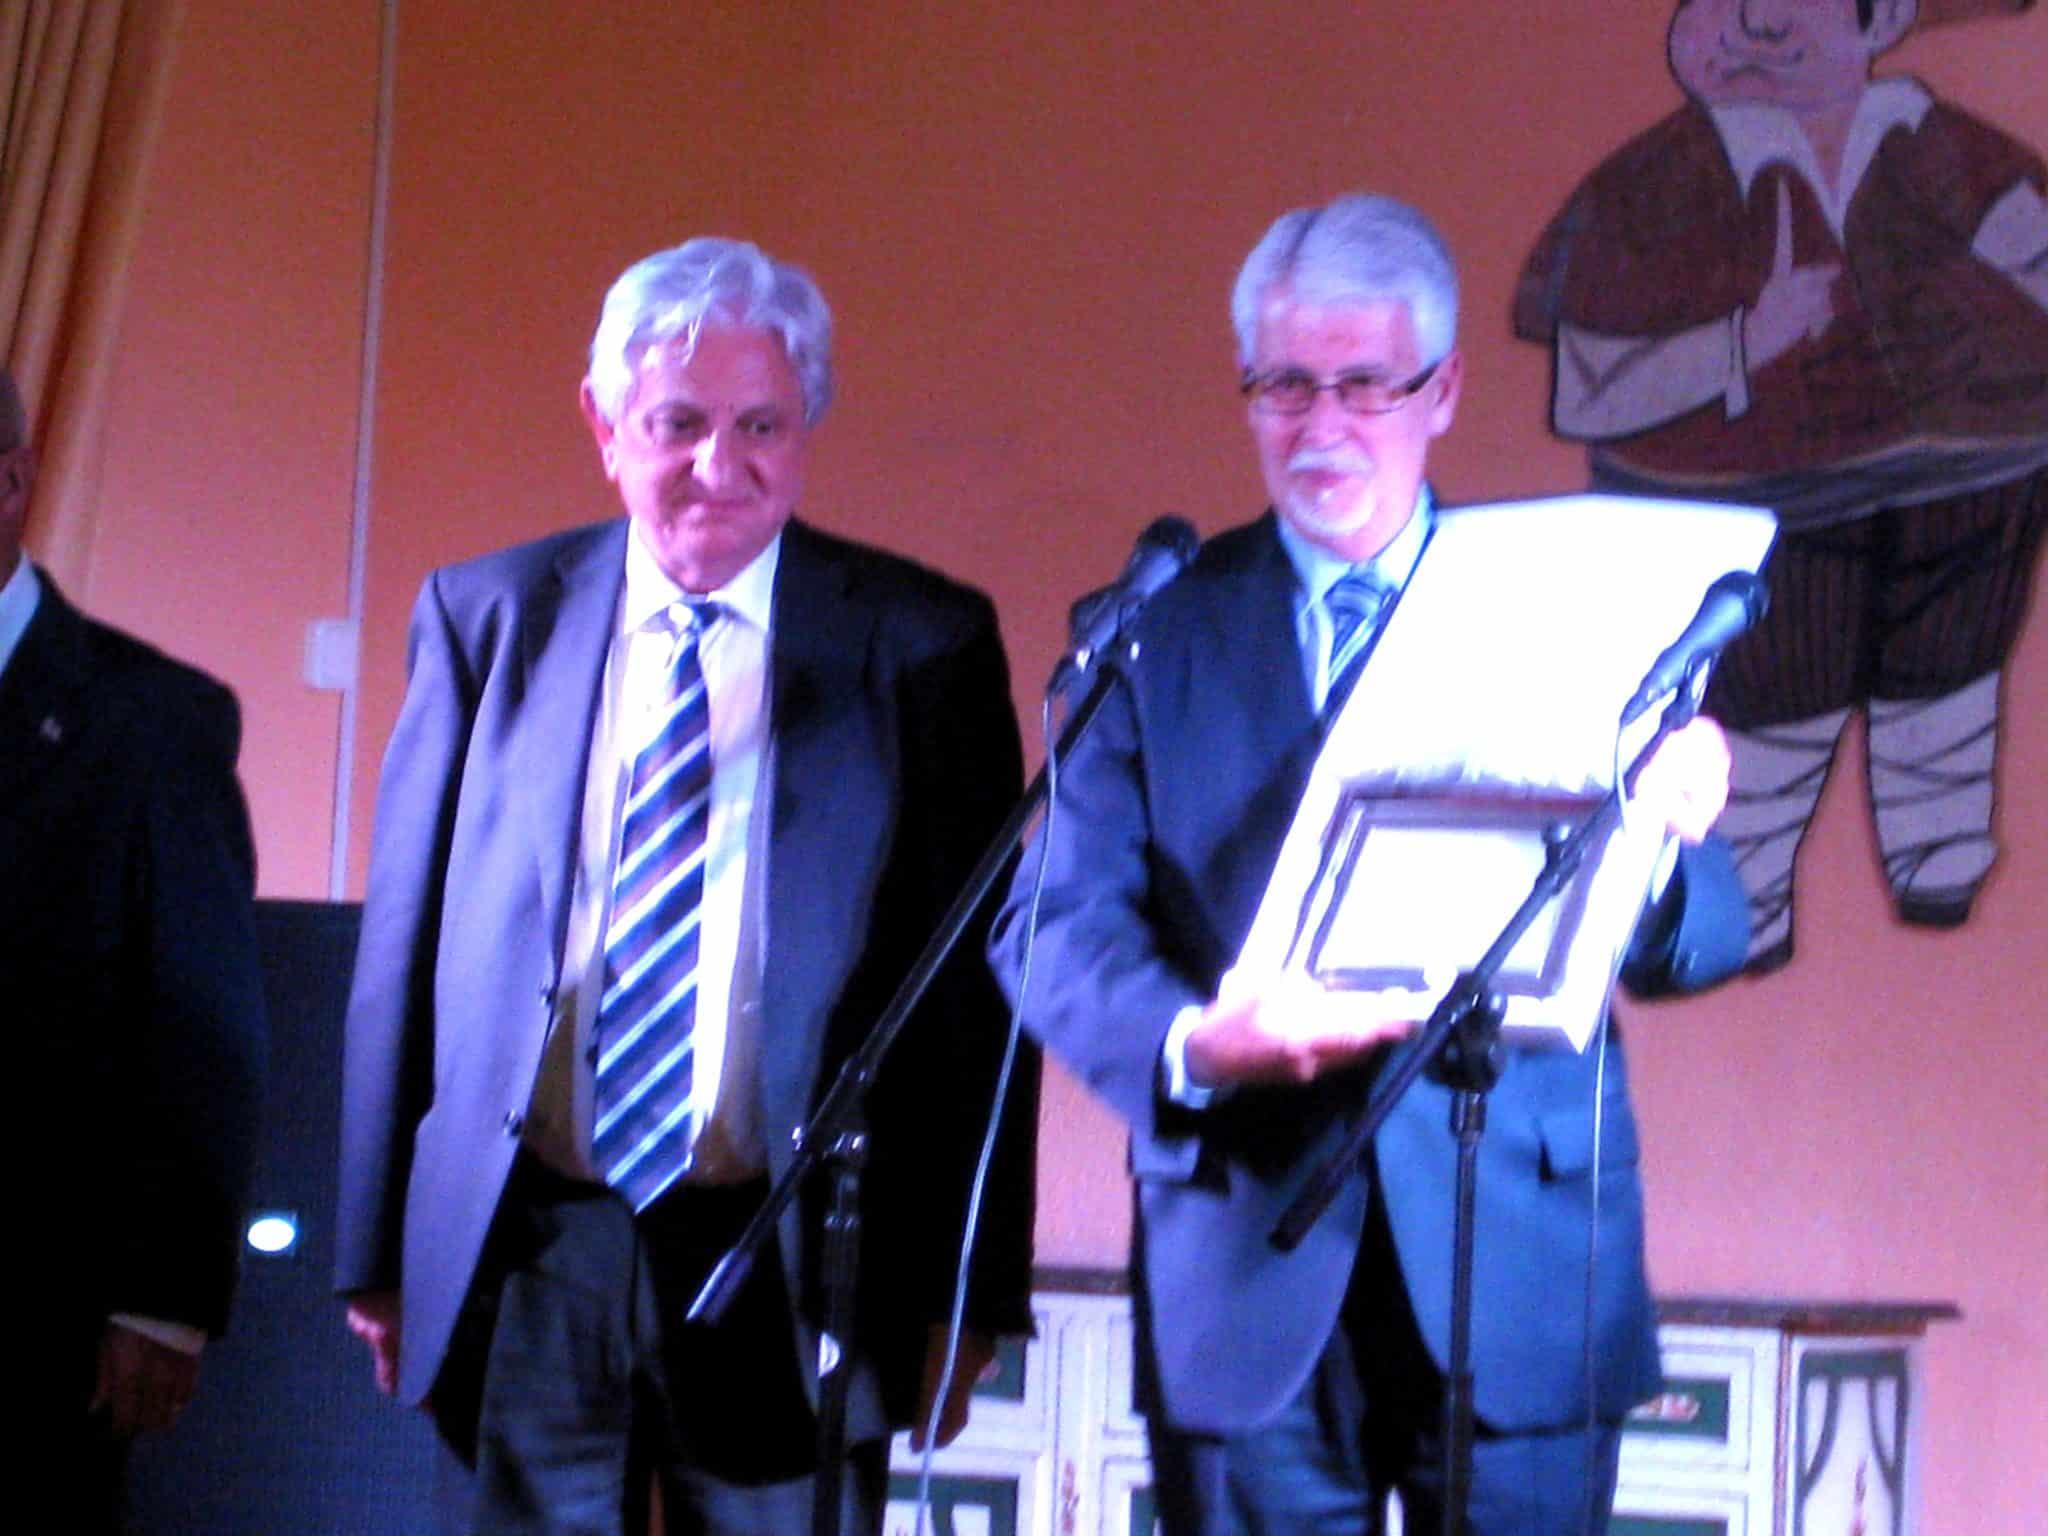 https://blog.globalcaja.es/wp-content/uploads/2015/10/albacete-premio.jpg